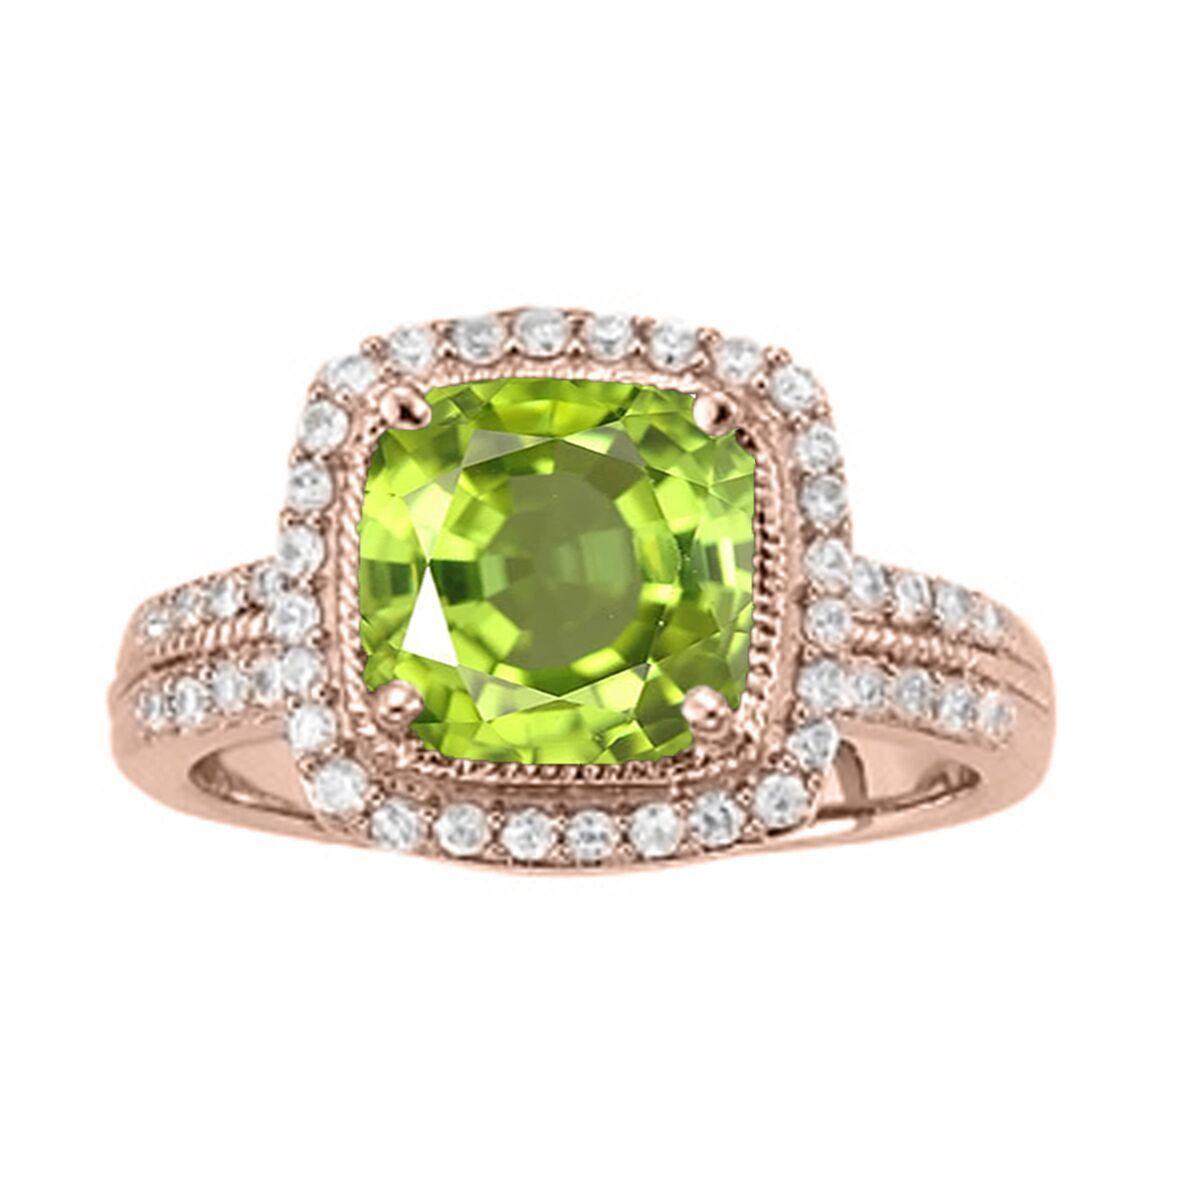 2.60 Ct. Ttw Diamond And Cushion Cut Peridot Ring In 14K gold